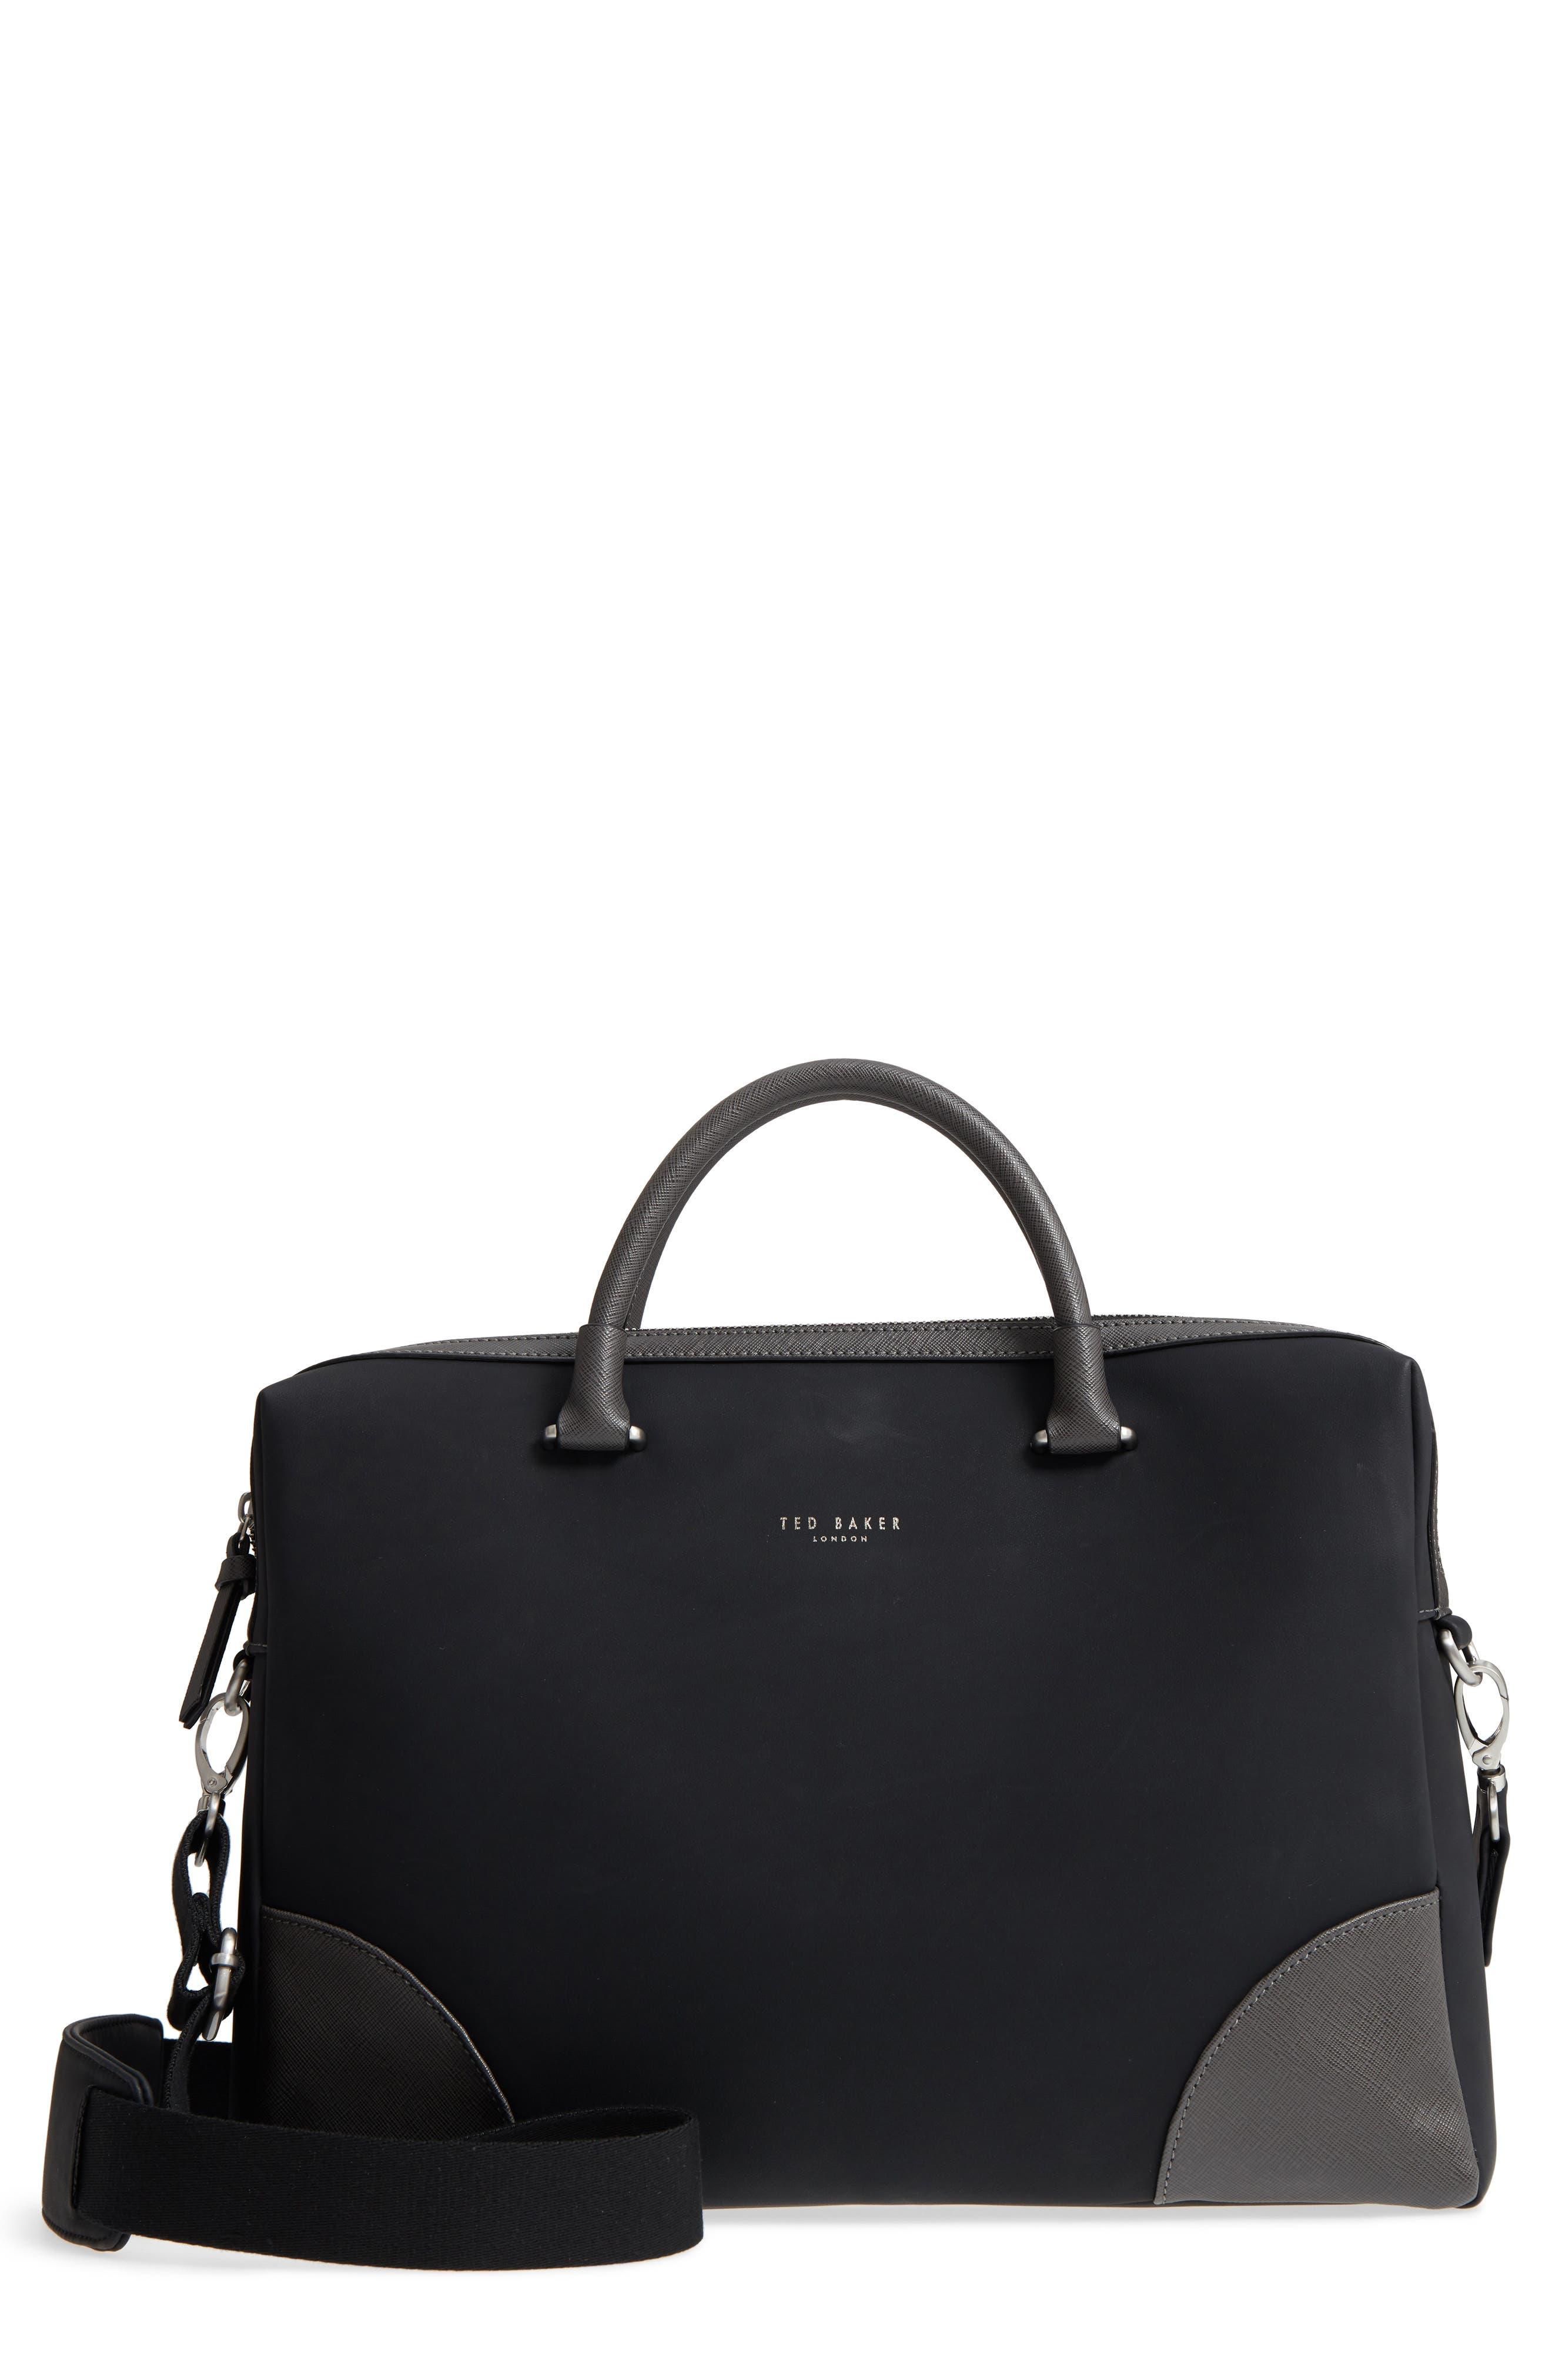 Matcher Document Bag,                         Main,                         color, BLACK